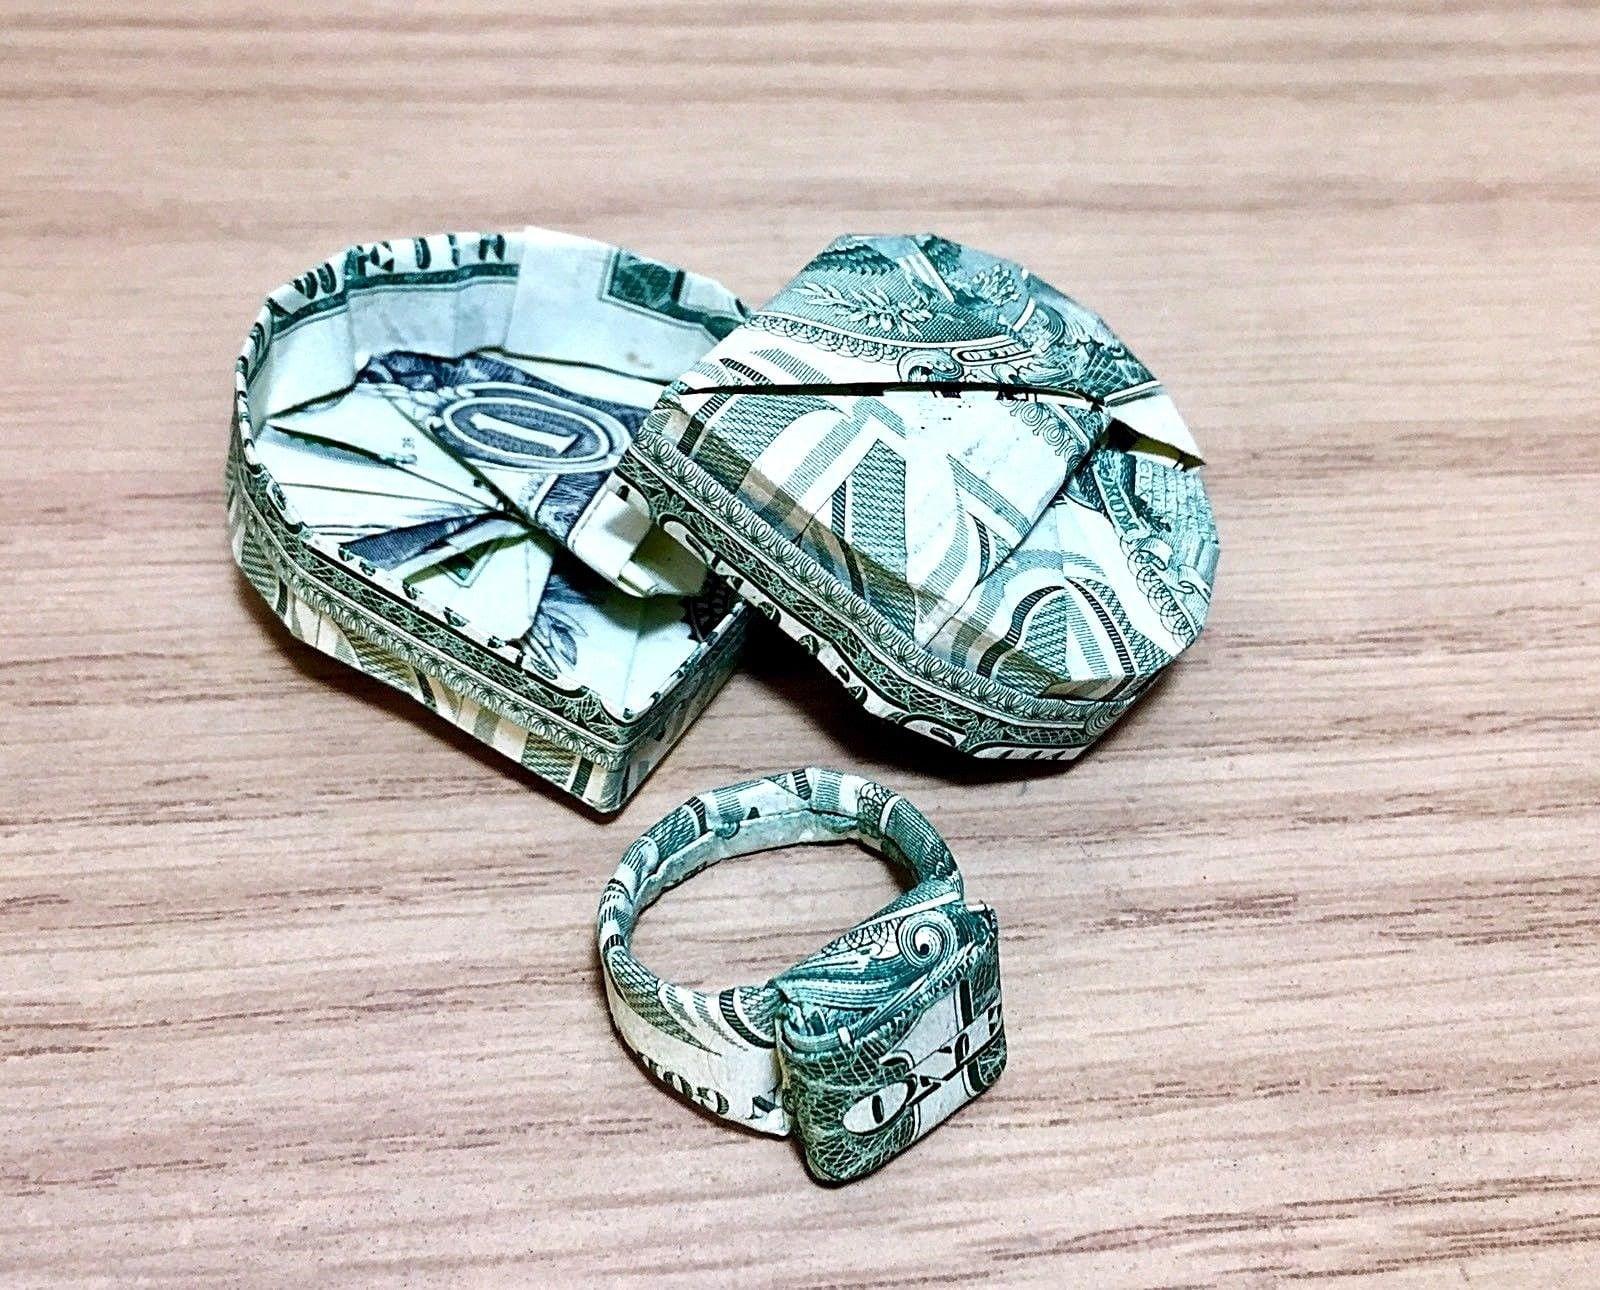 Money Origami ring heart box US dollar bill ring with | Etsy - photo#38